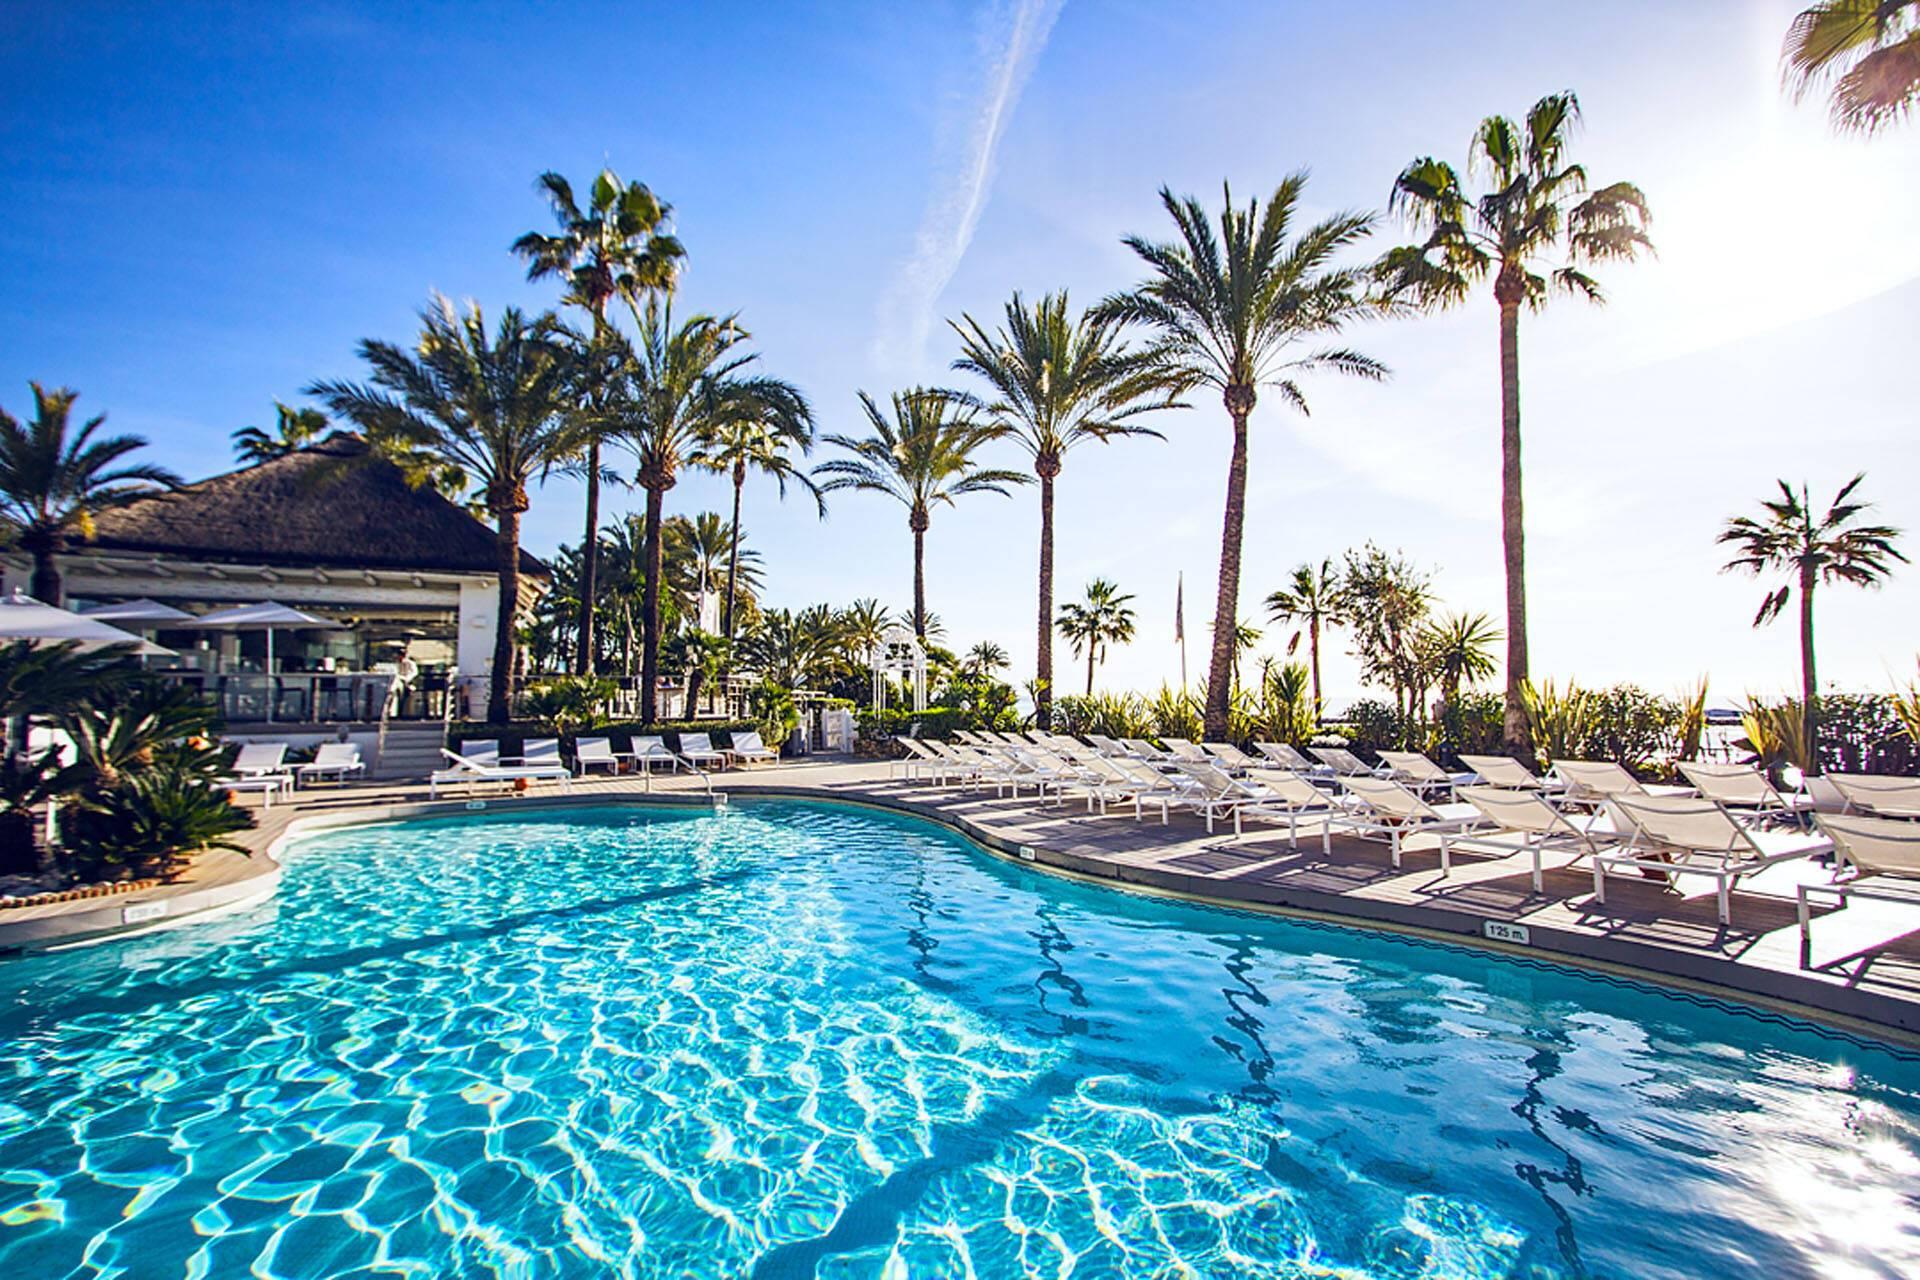 Puente Romano Marbella Andalousie Sea Grill Pool